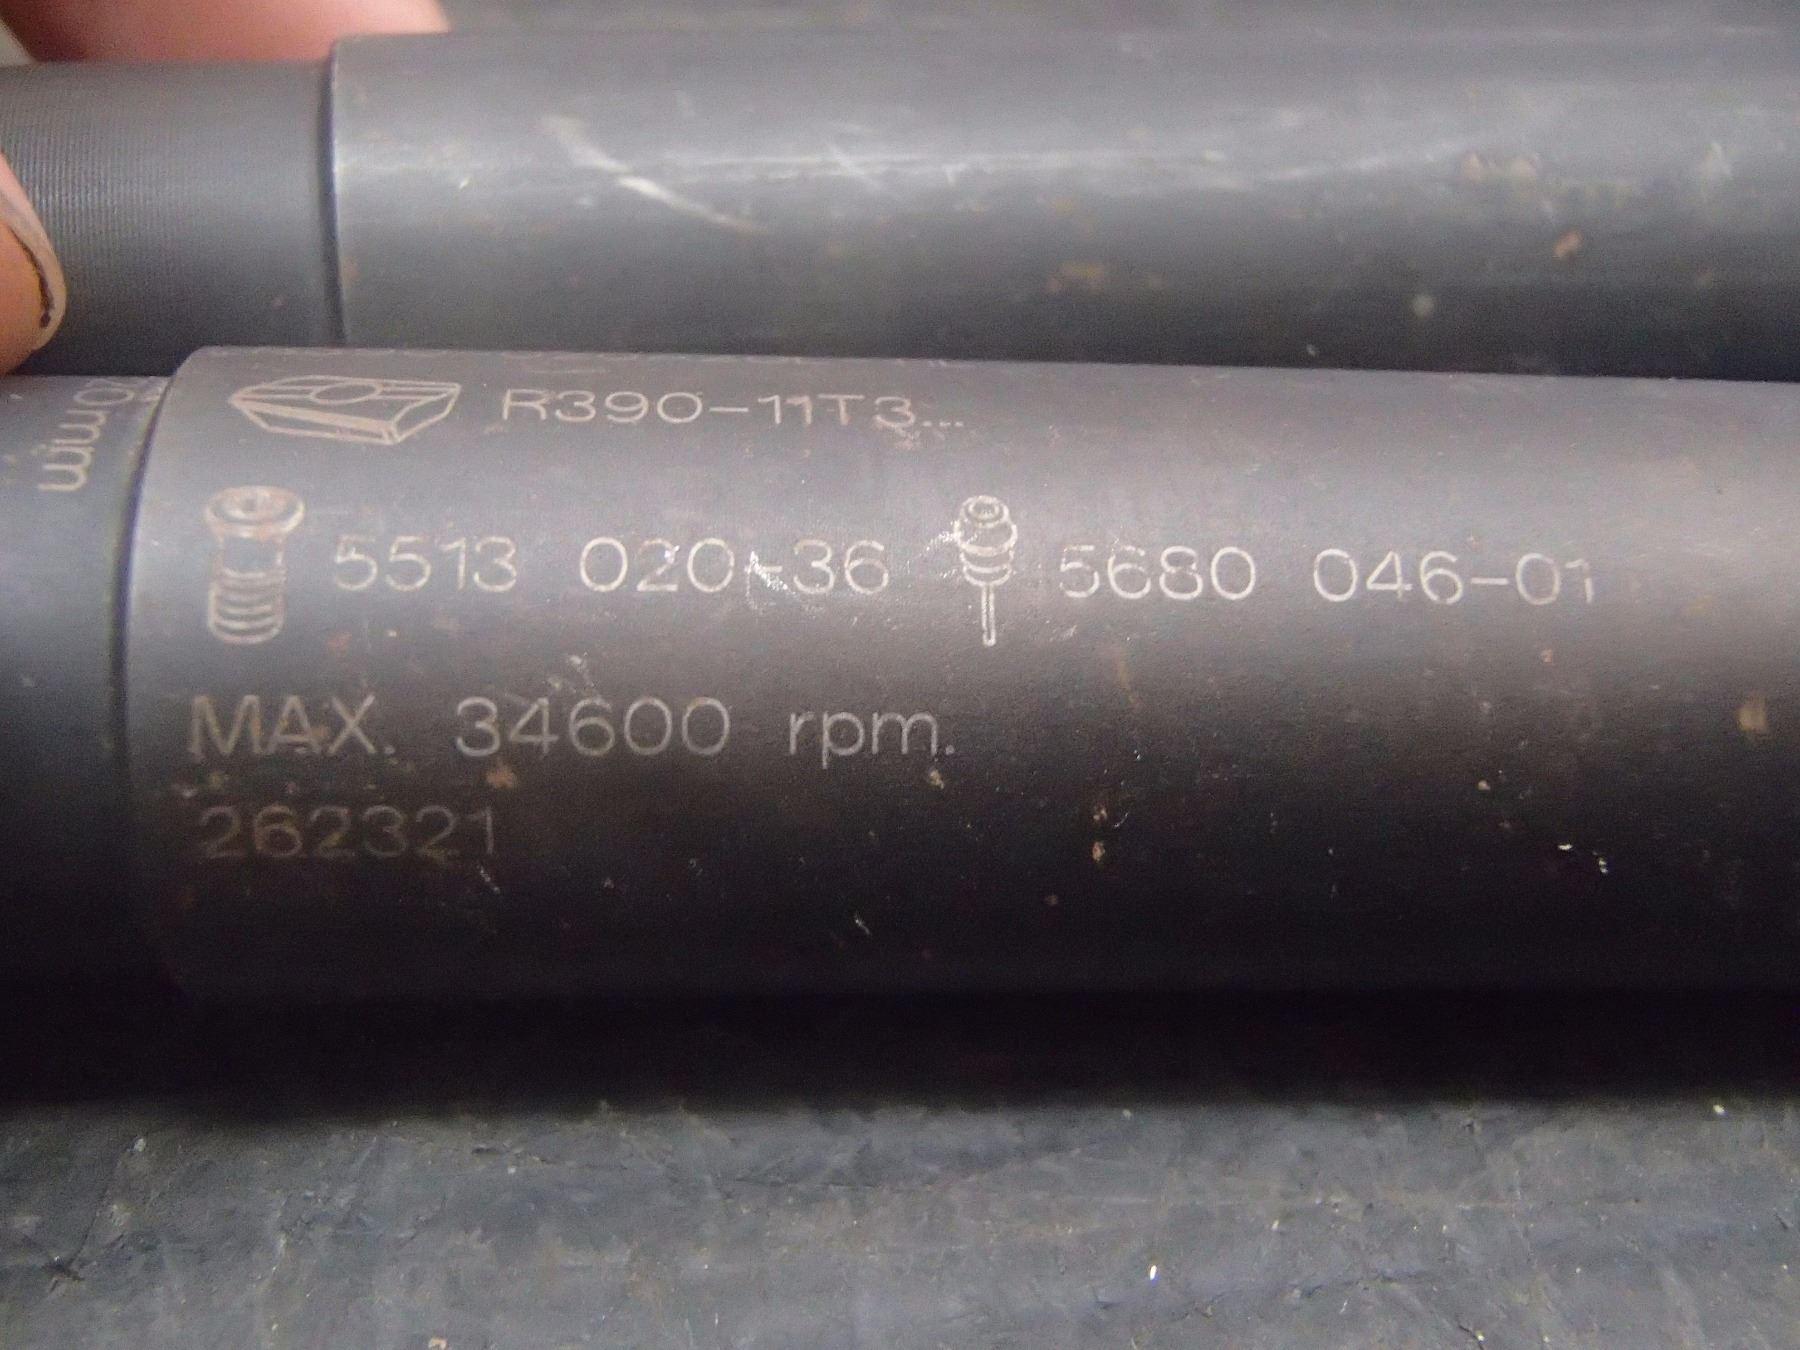 Sandvik 20mm Indexable Coolant Thru End Mills, P/N: R390-020A20L-11L